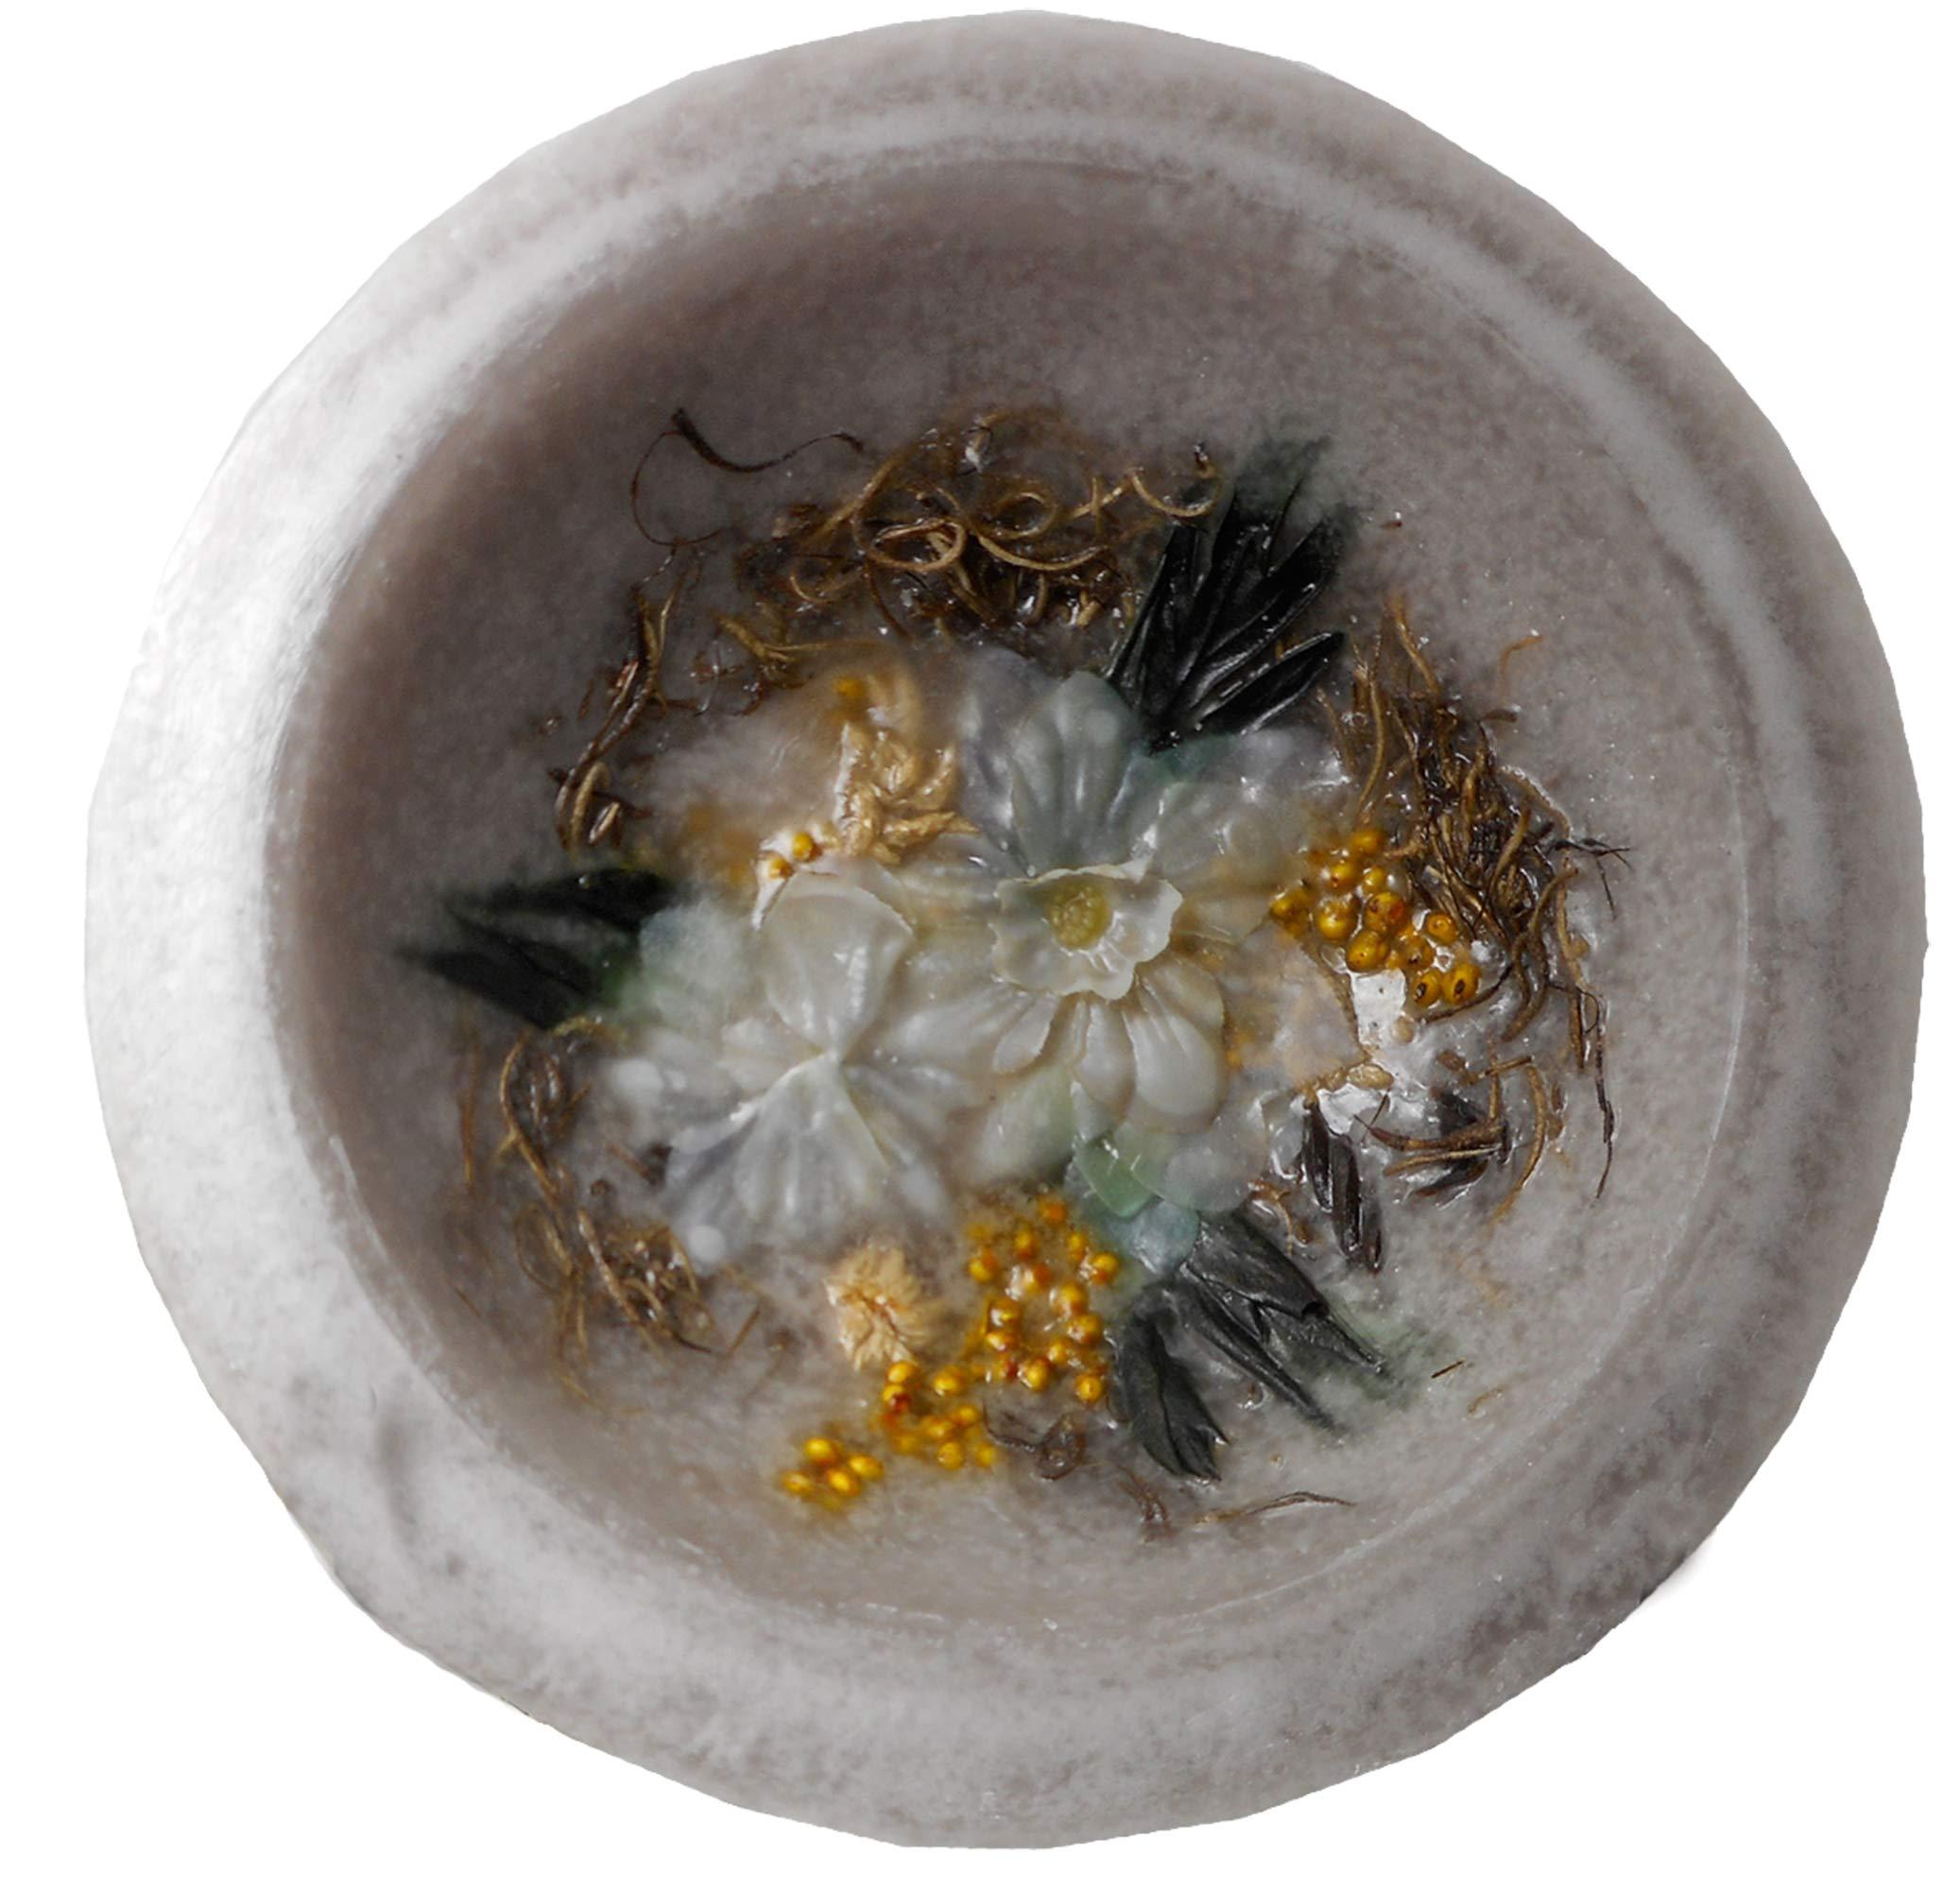 Habersham Garden Vanilla Personal Space Wax Pottery Vessel